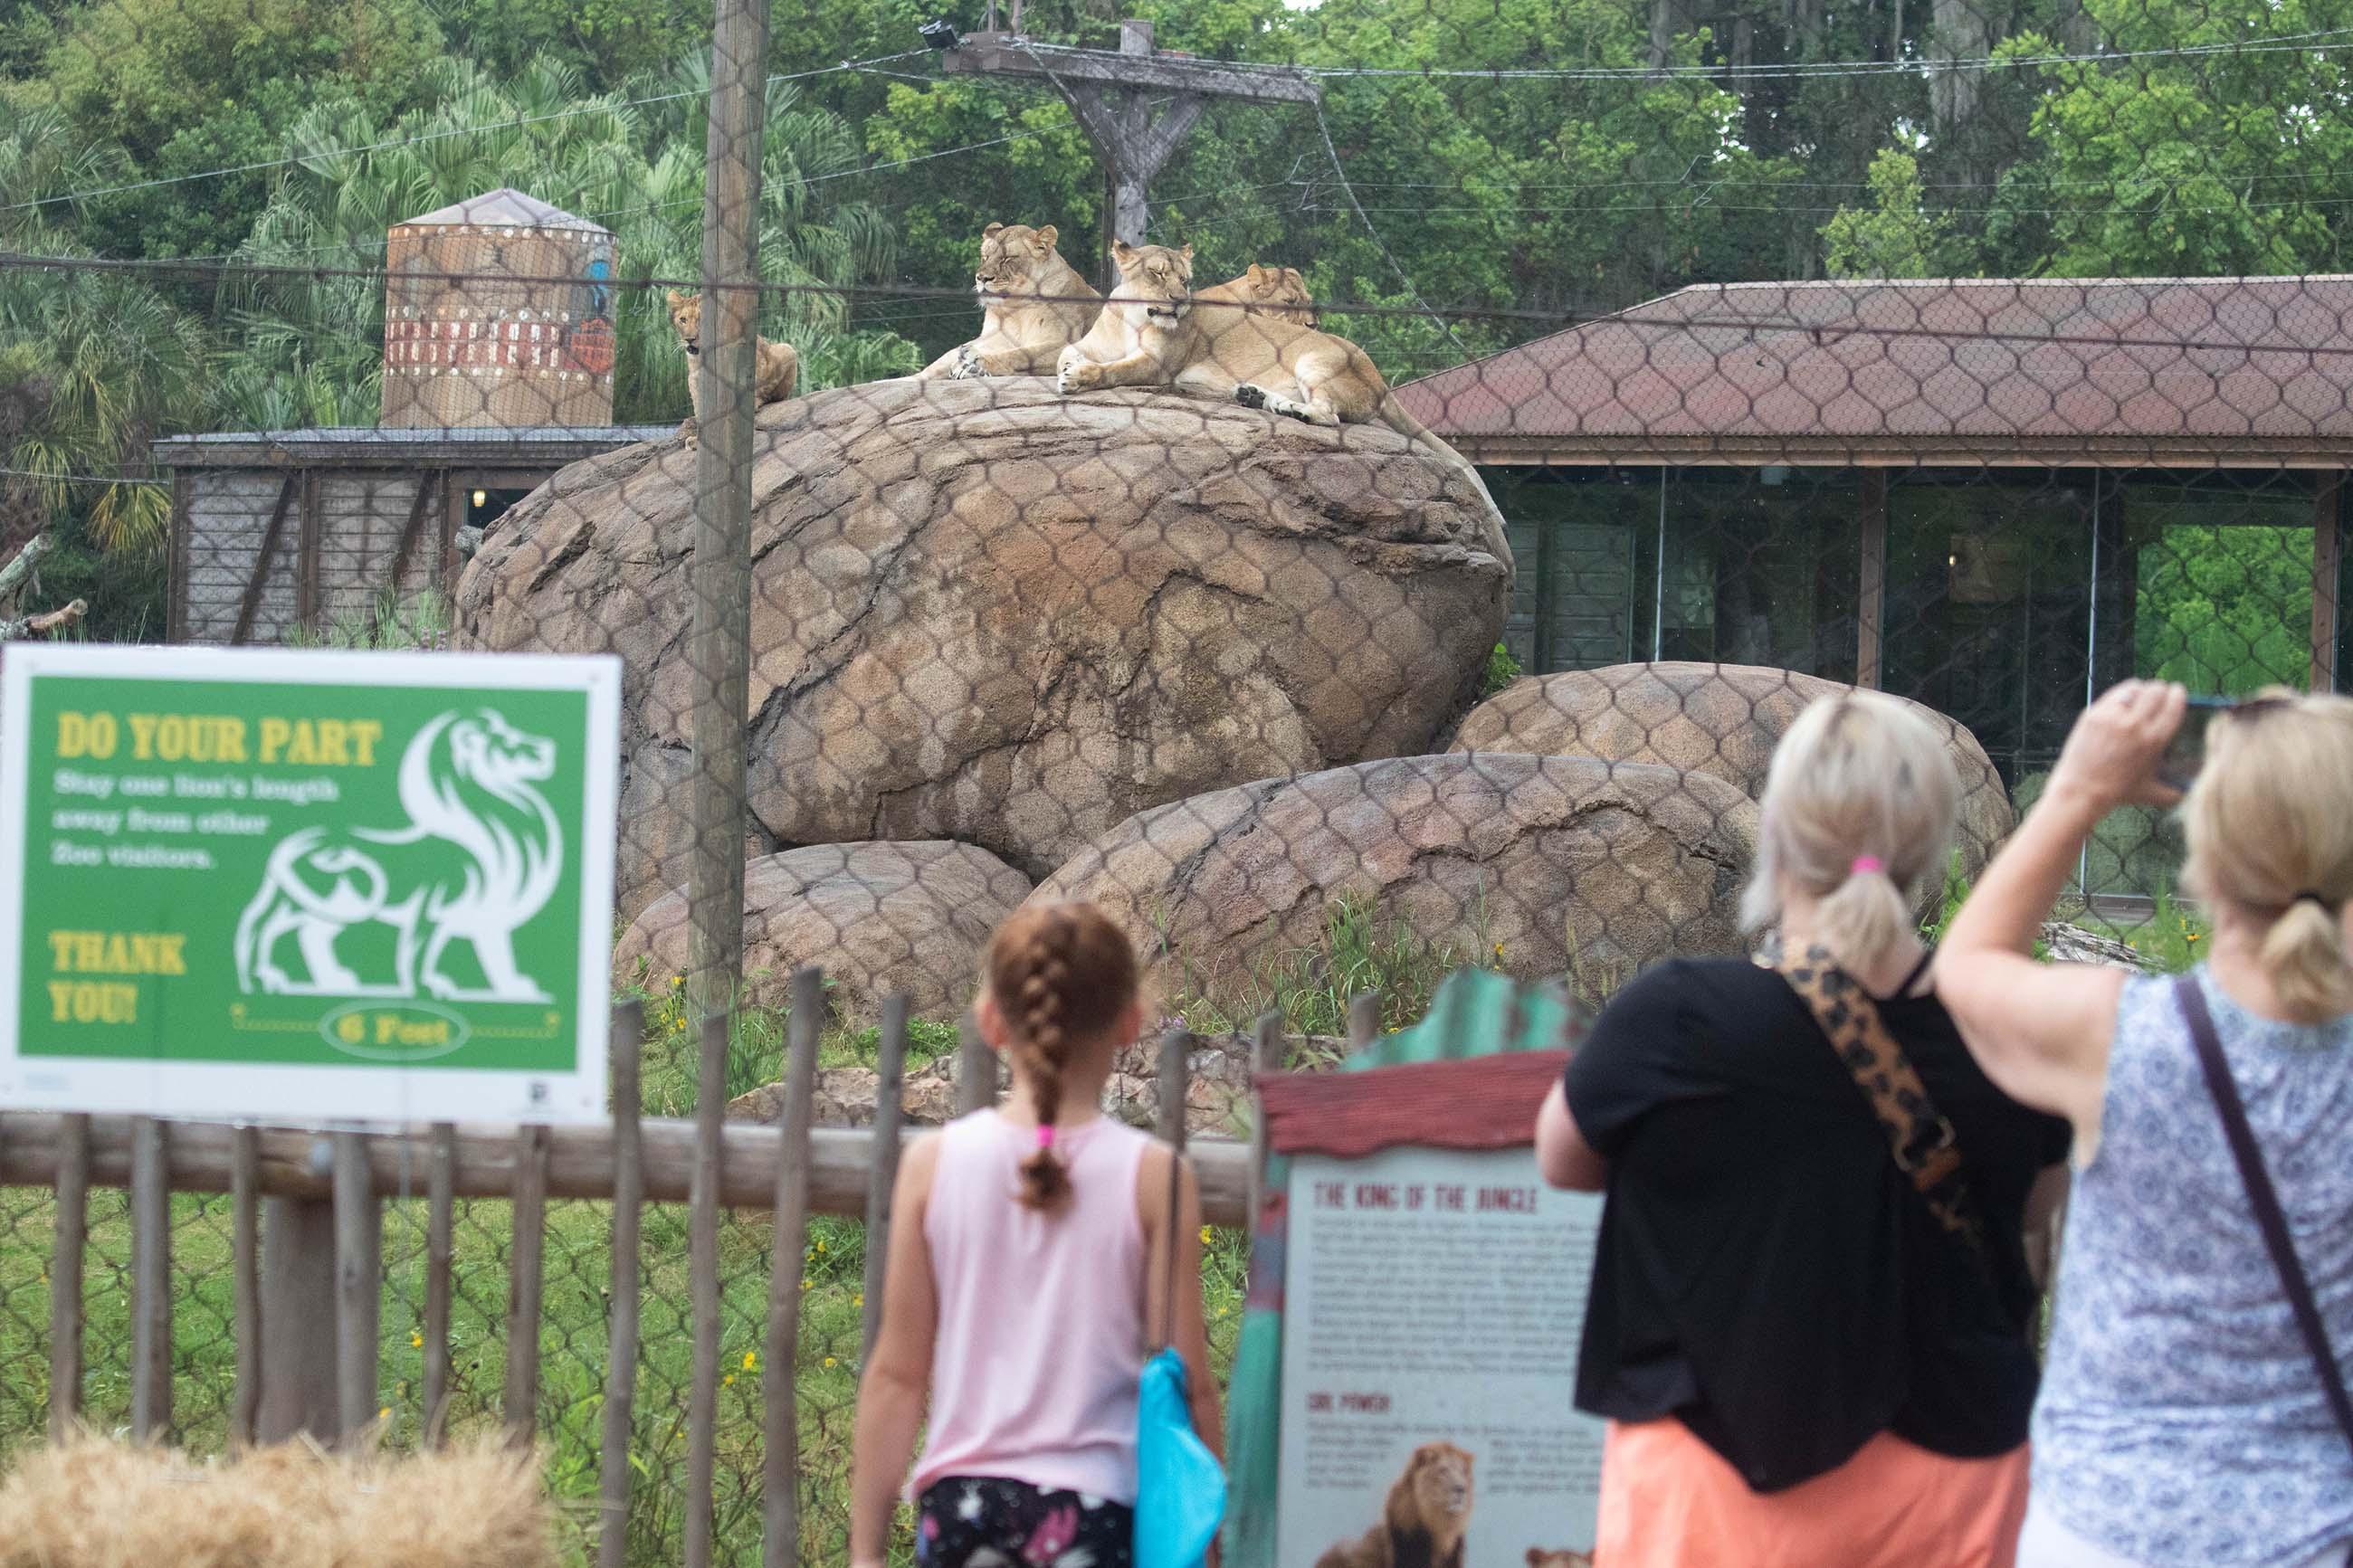 Family at the lion habitat